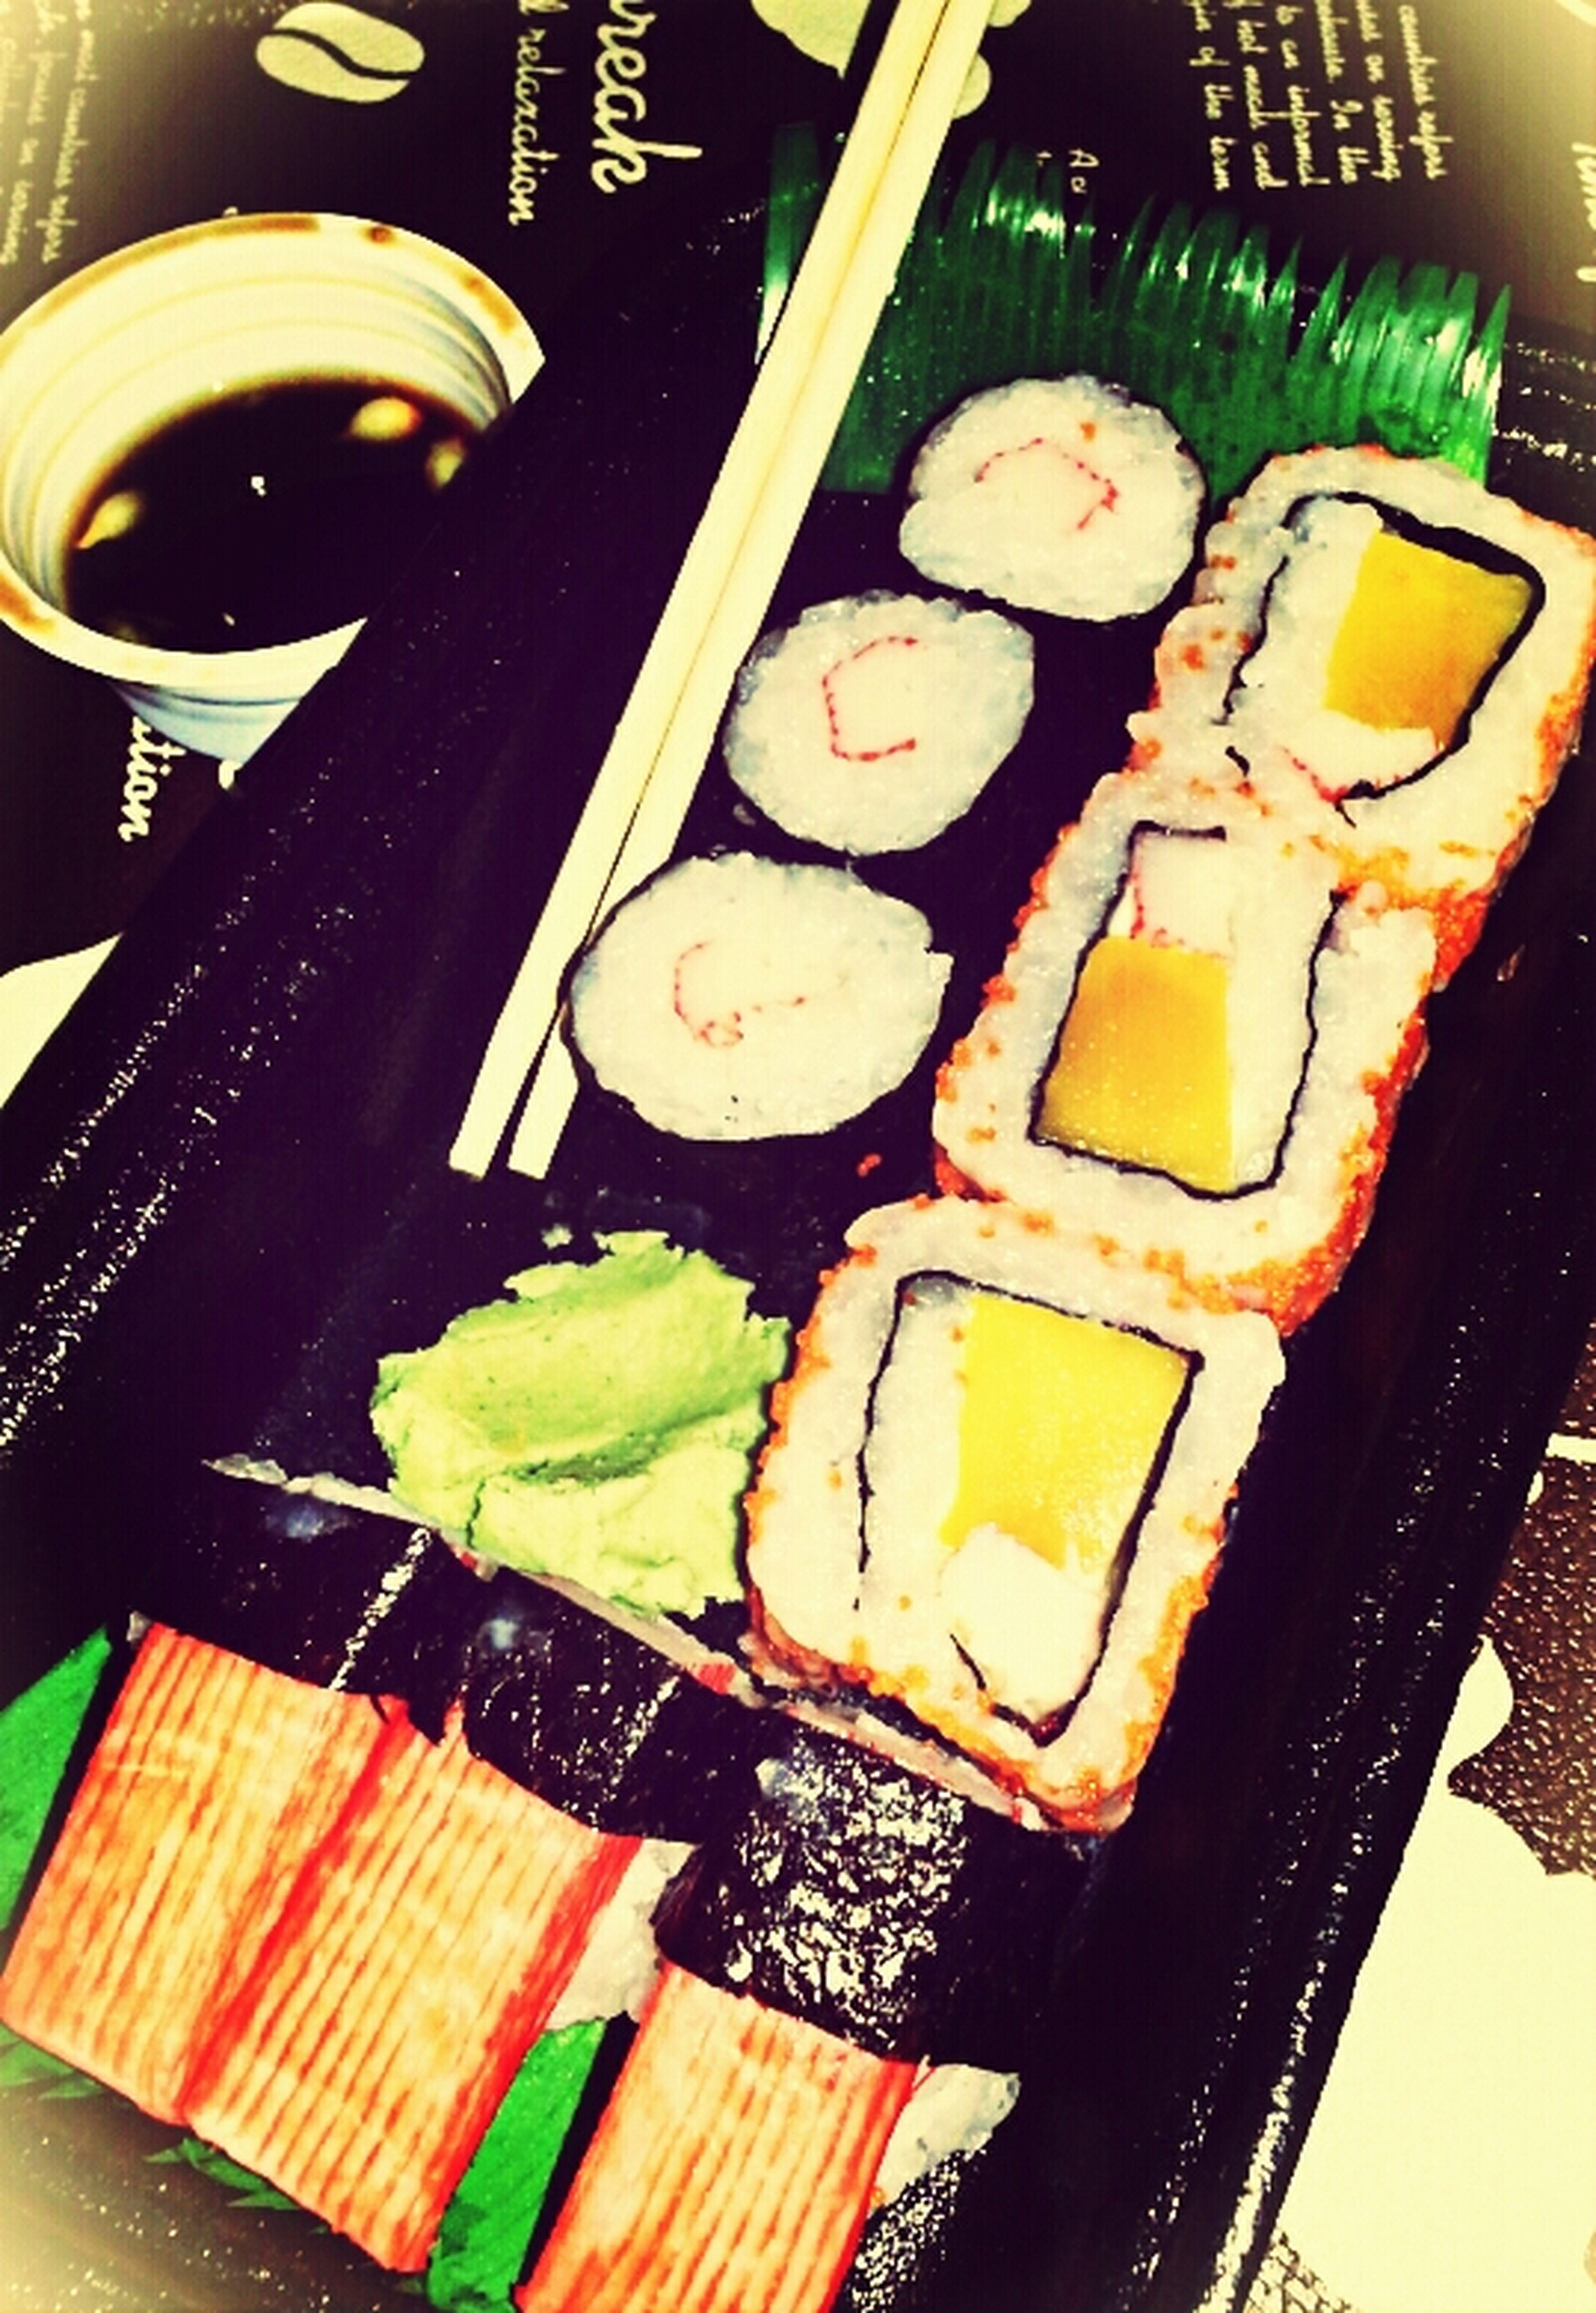 Dinner Time Kani Maki Allaboutme♥ Lets eat bebe love :))